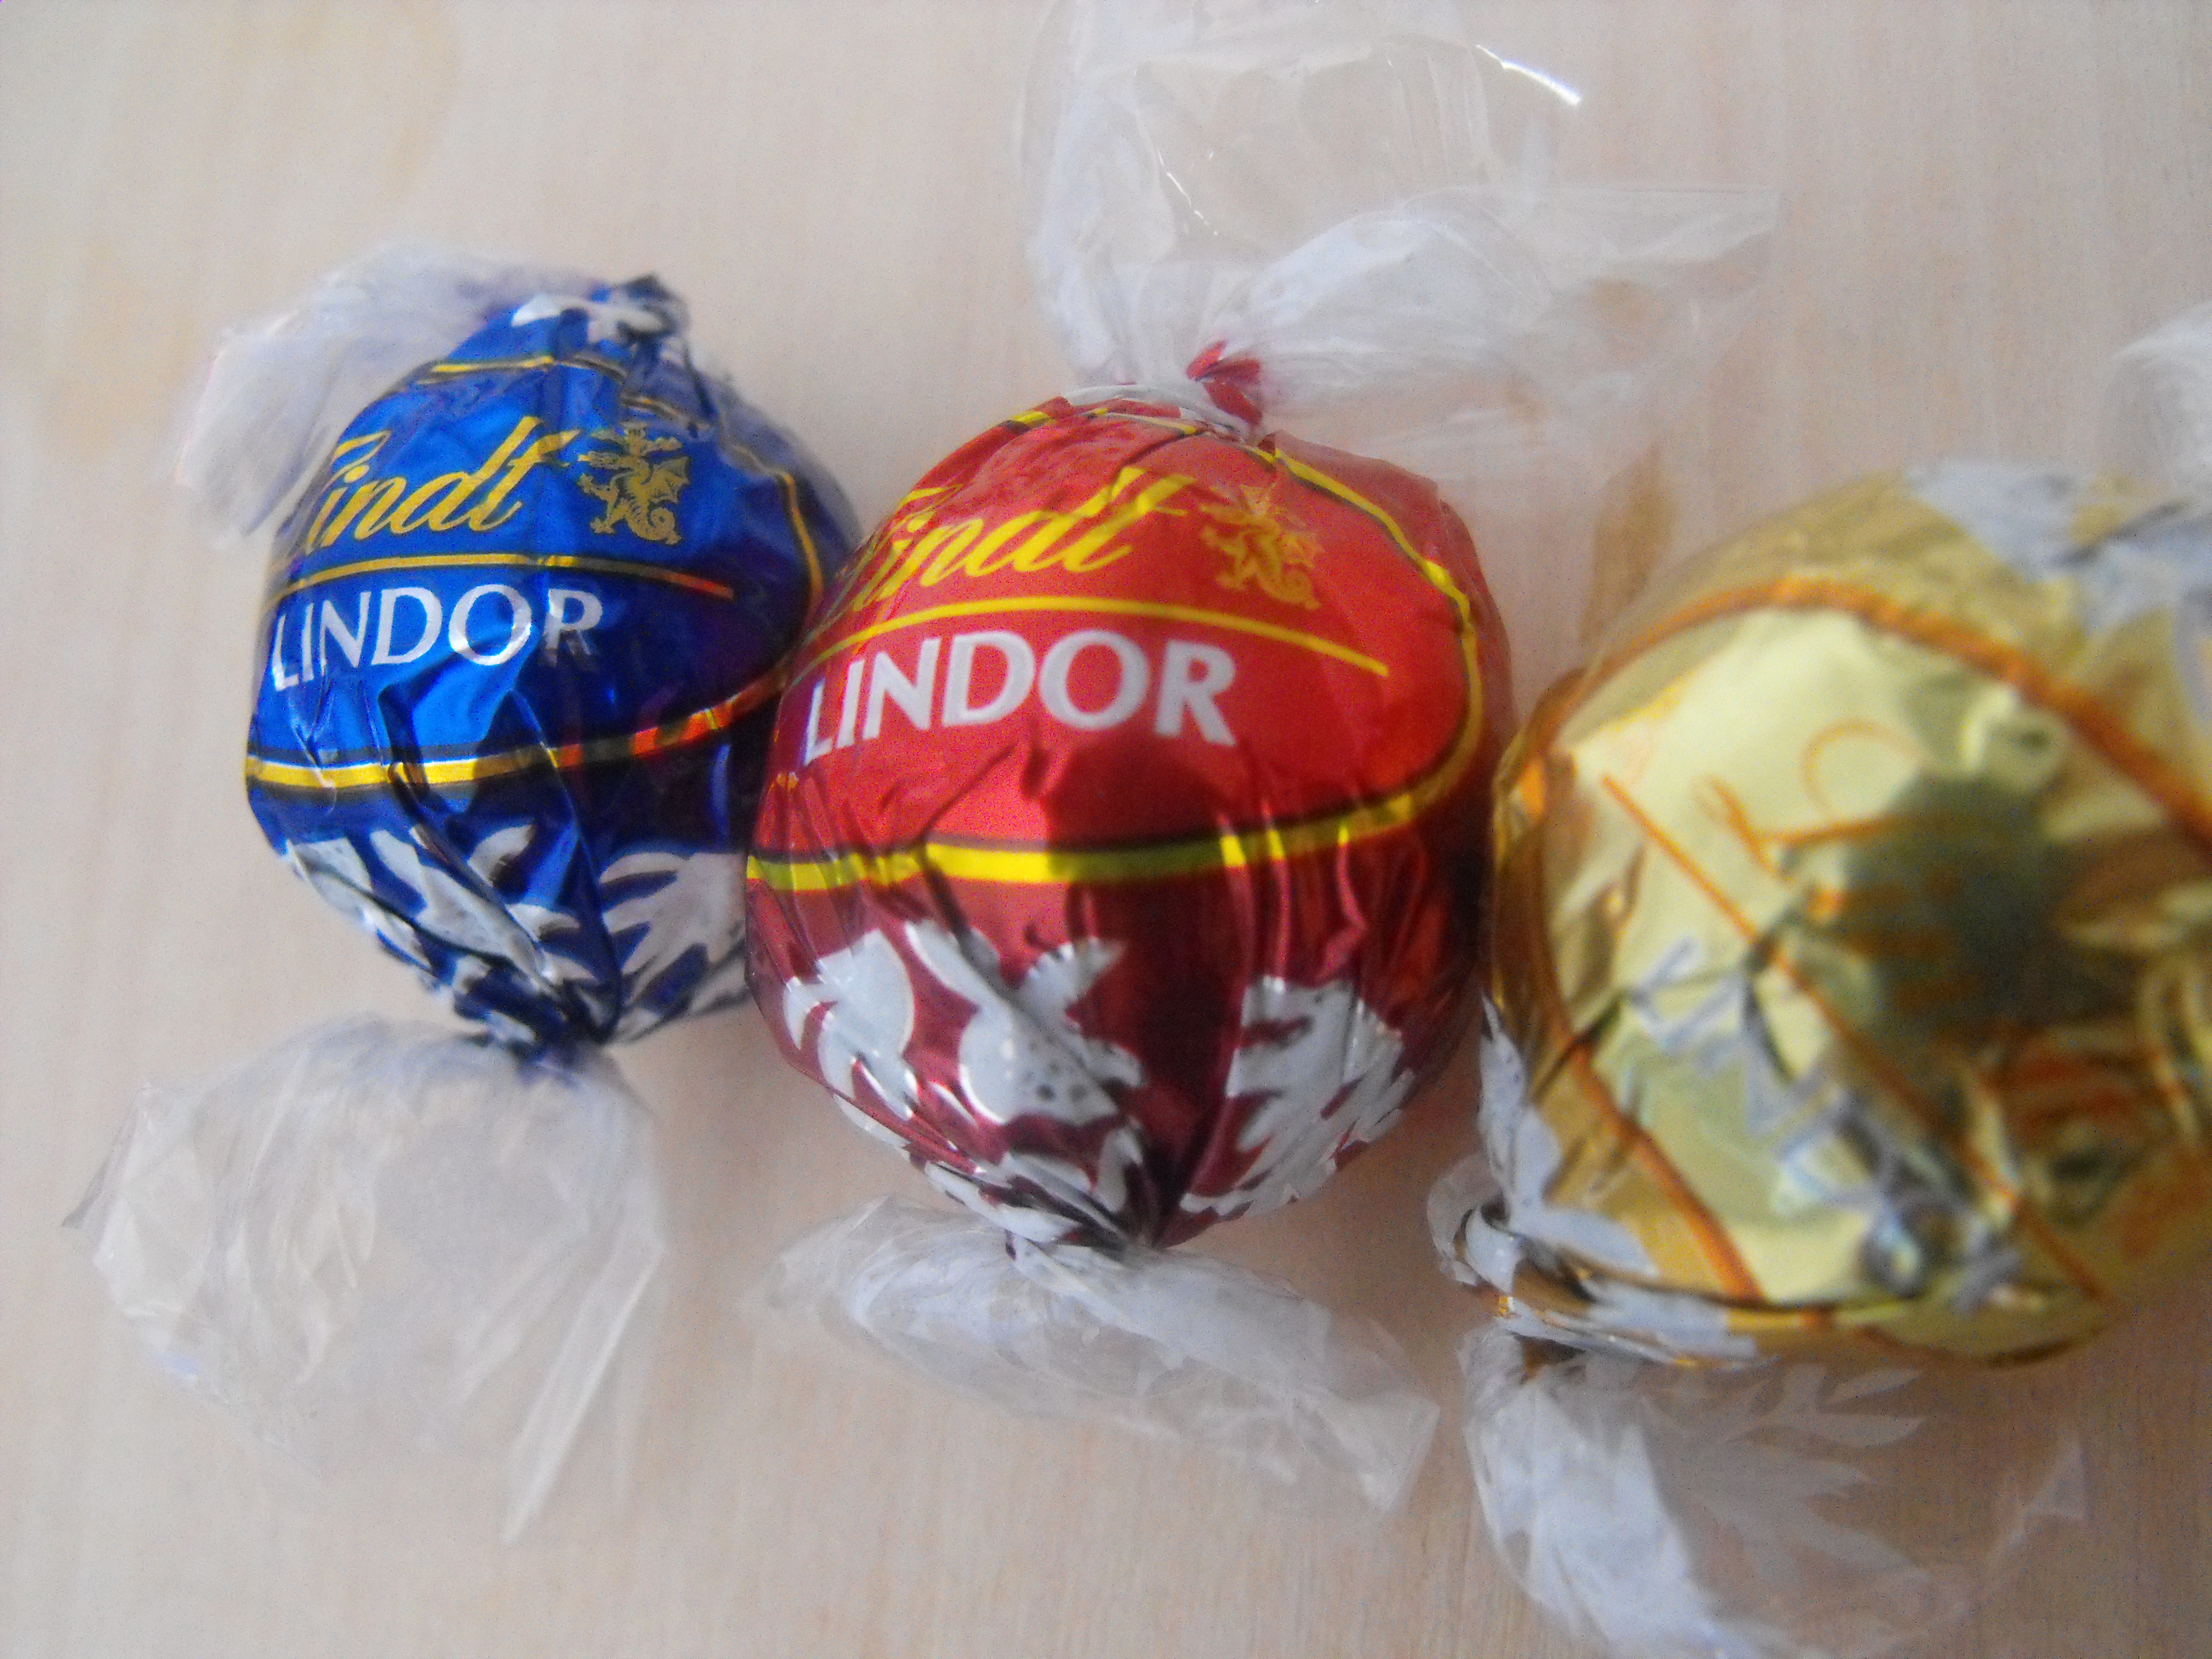 https://foodloader.net/cutie_2009-02-23_Lindt_Chocolates.jpg